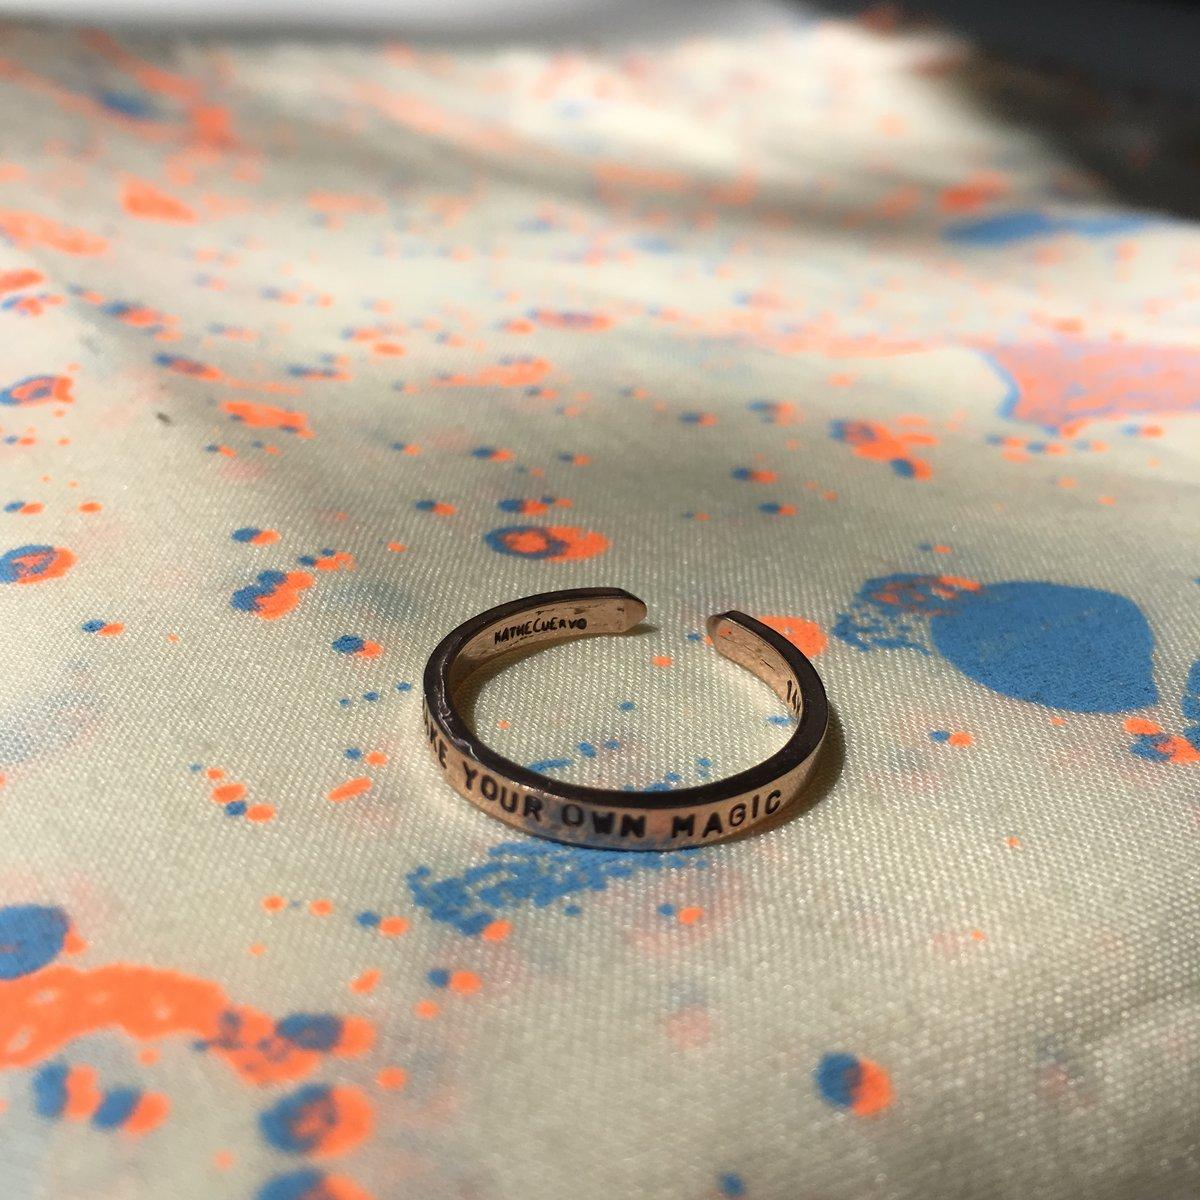 Image of adjustable 18k gold custom ring